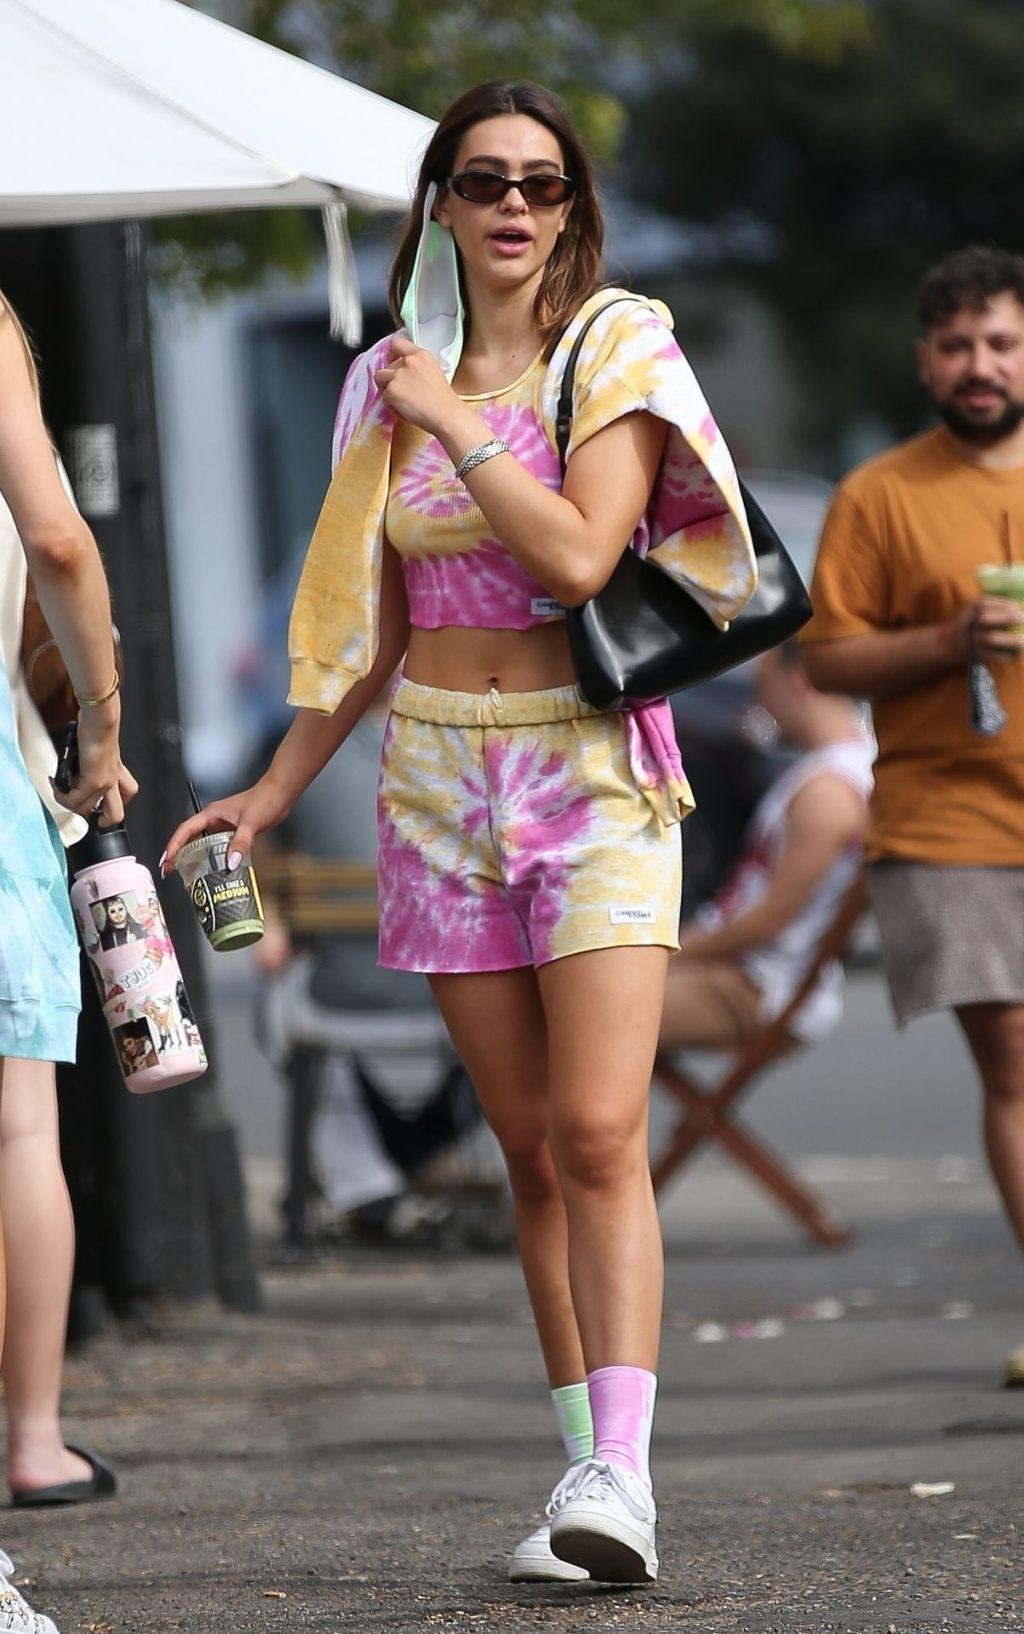 Amelia Hamlin is a Happy Girl After Grabbing Juice in WeHo (17 Photos)